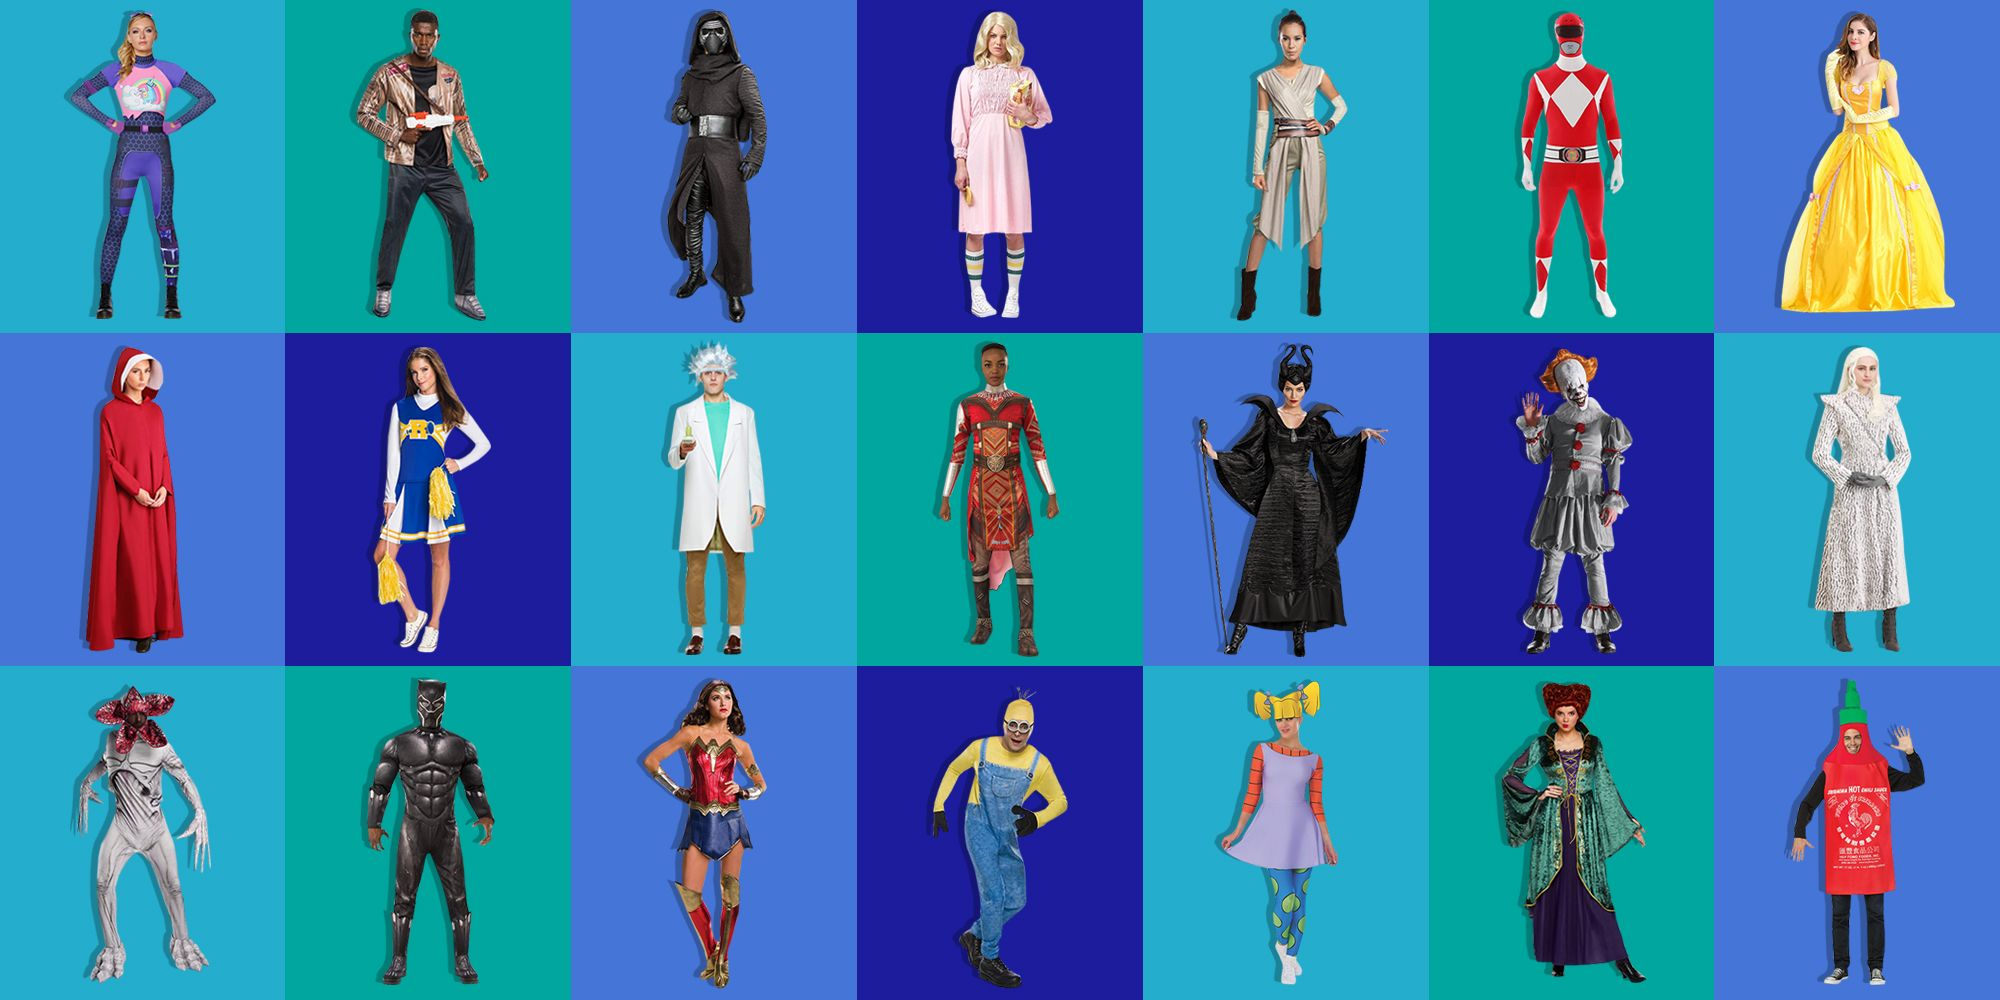 Early Halloween 2020 40 Best Halloween Costumes of 2020   Halloween Costume Ideas for